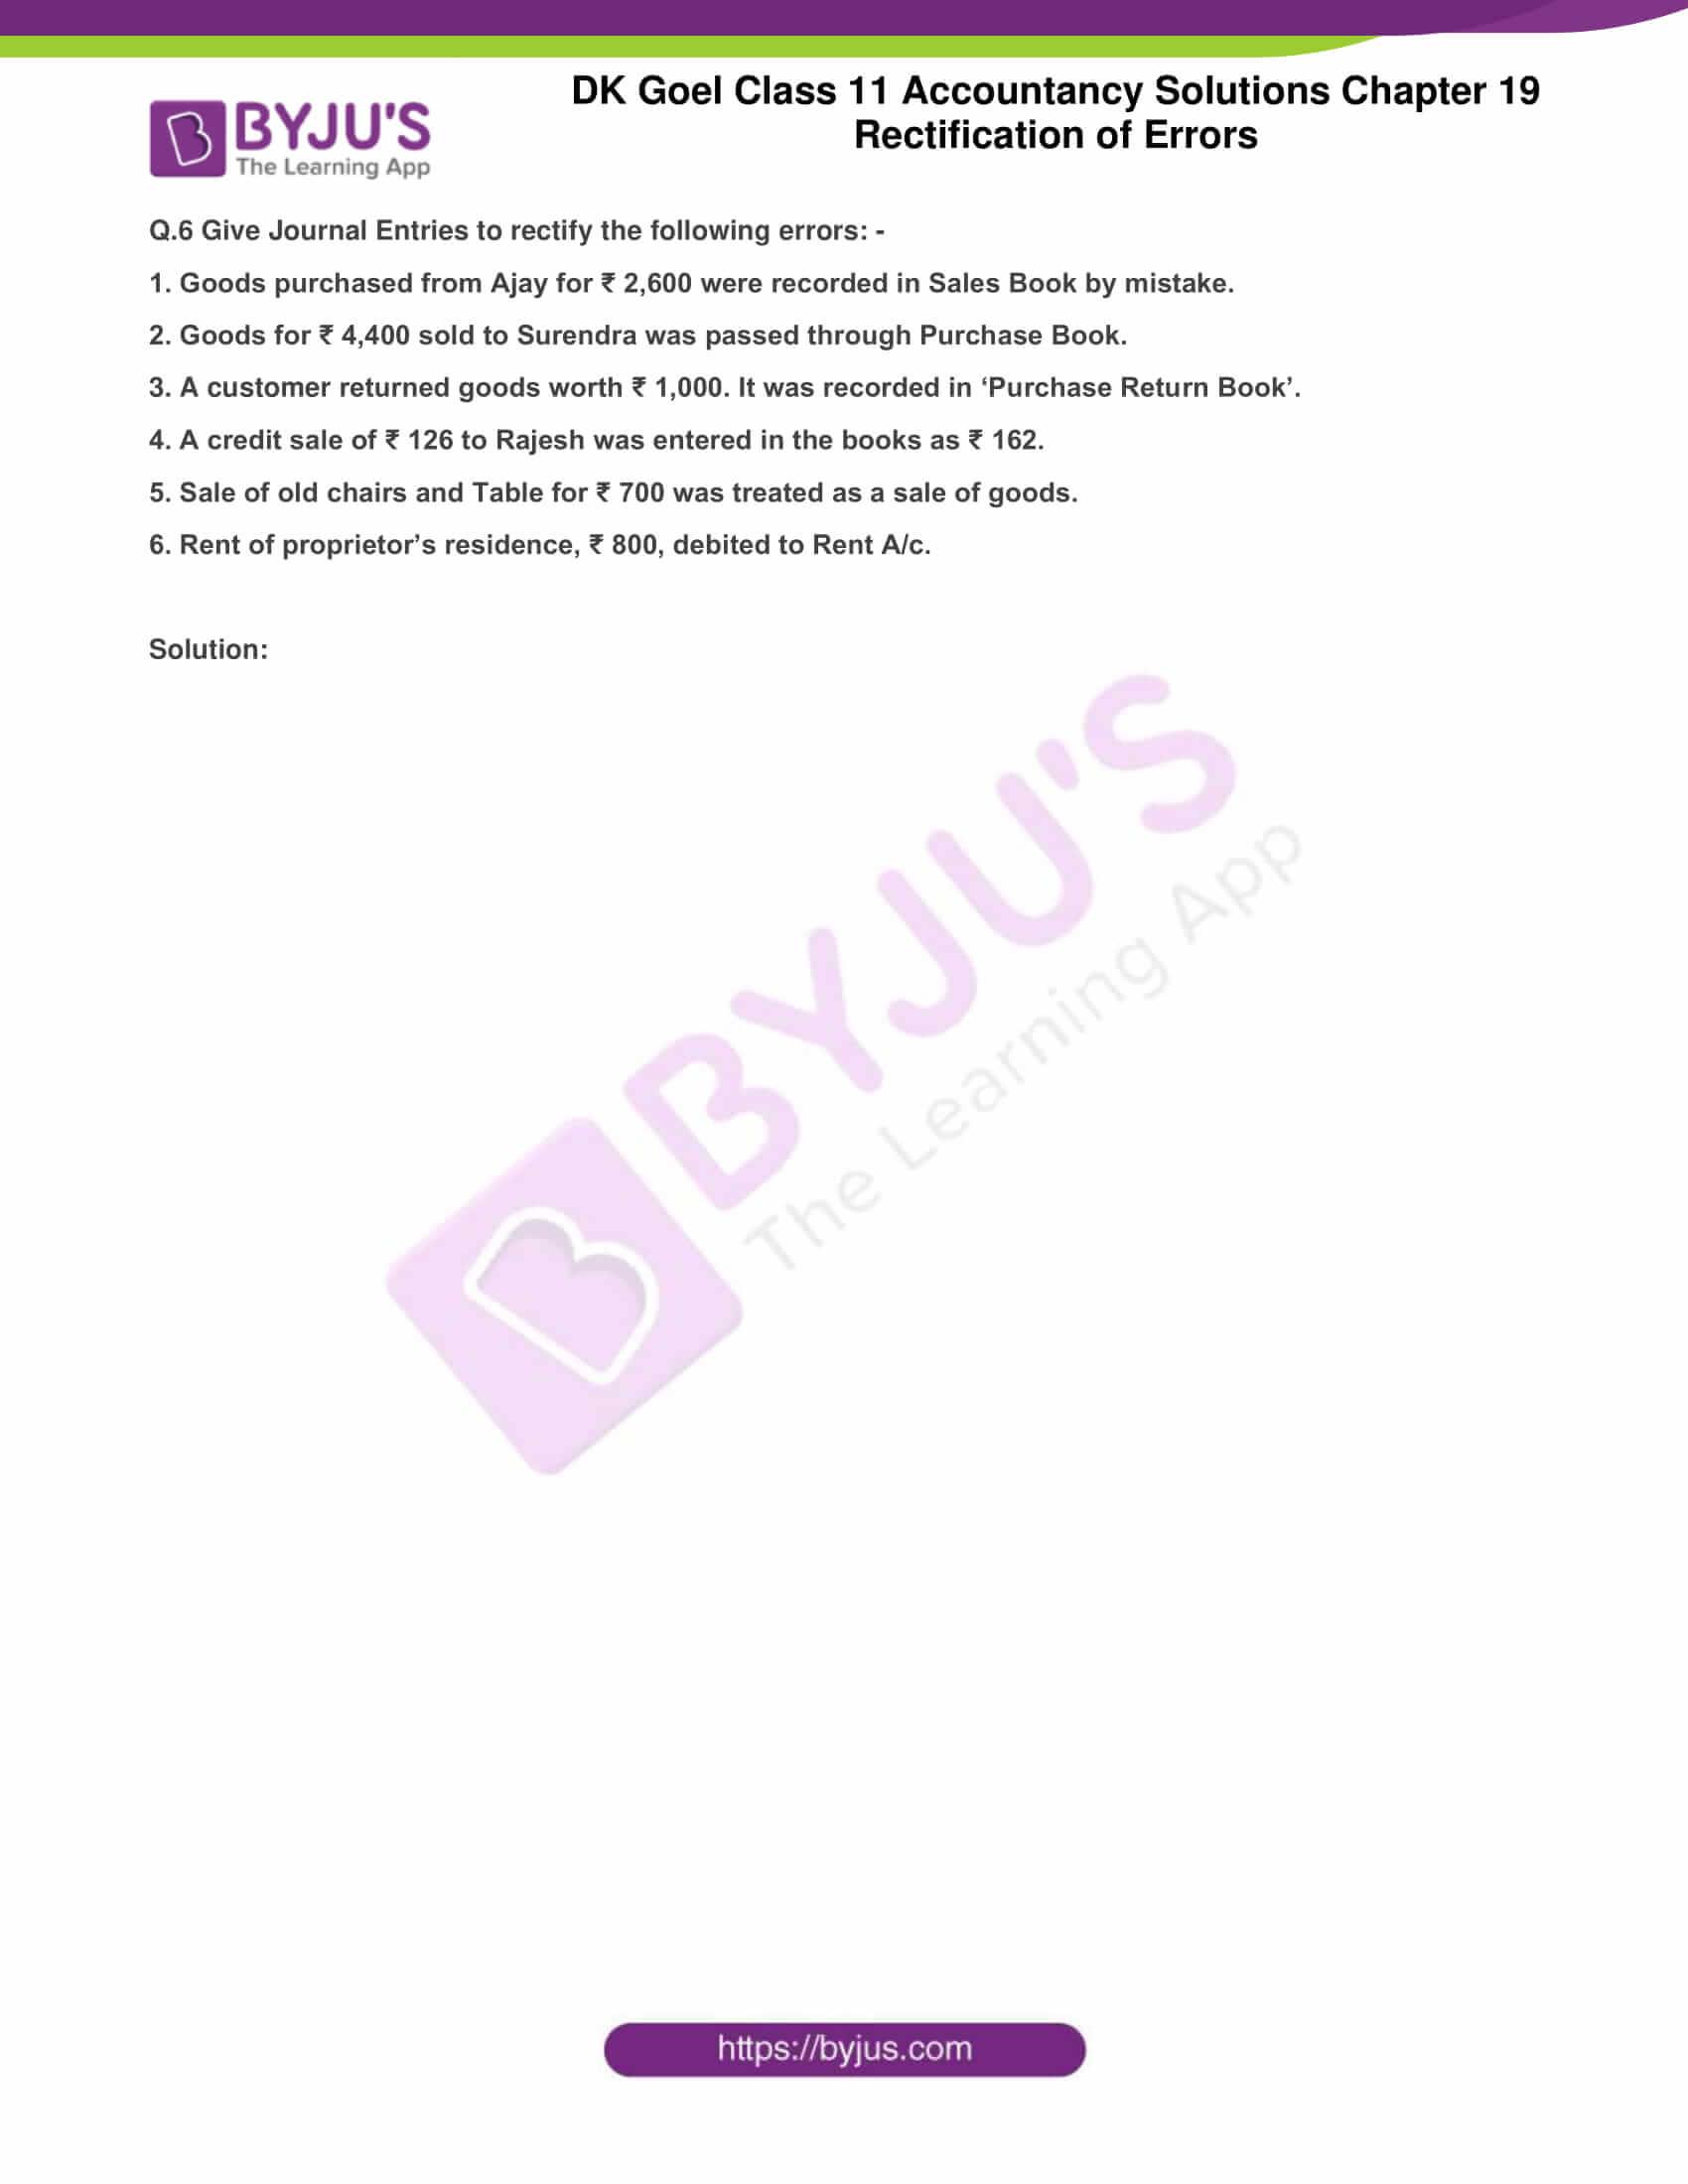 dk goel solutions class 11 accountancy chapter 19 rectification 08